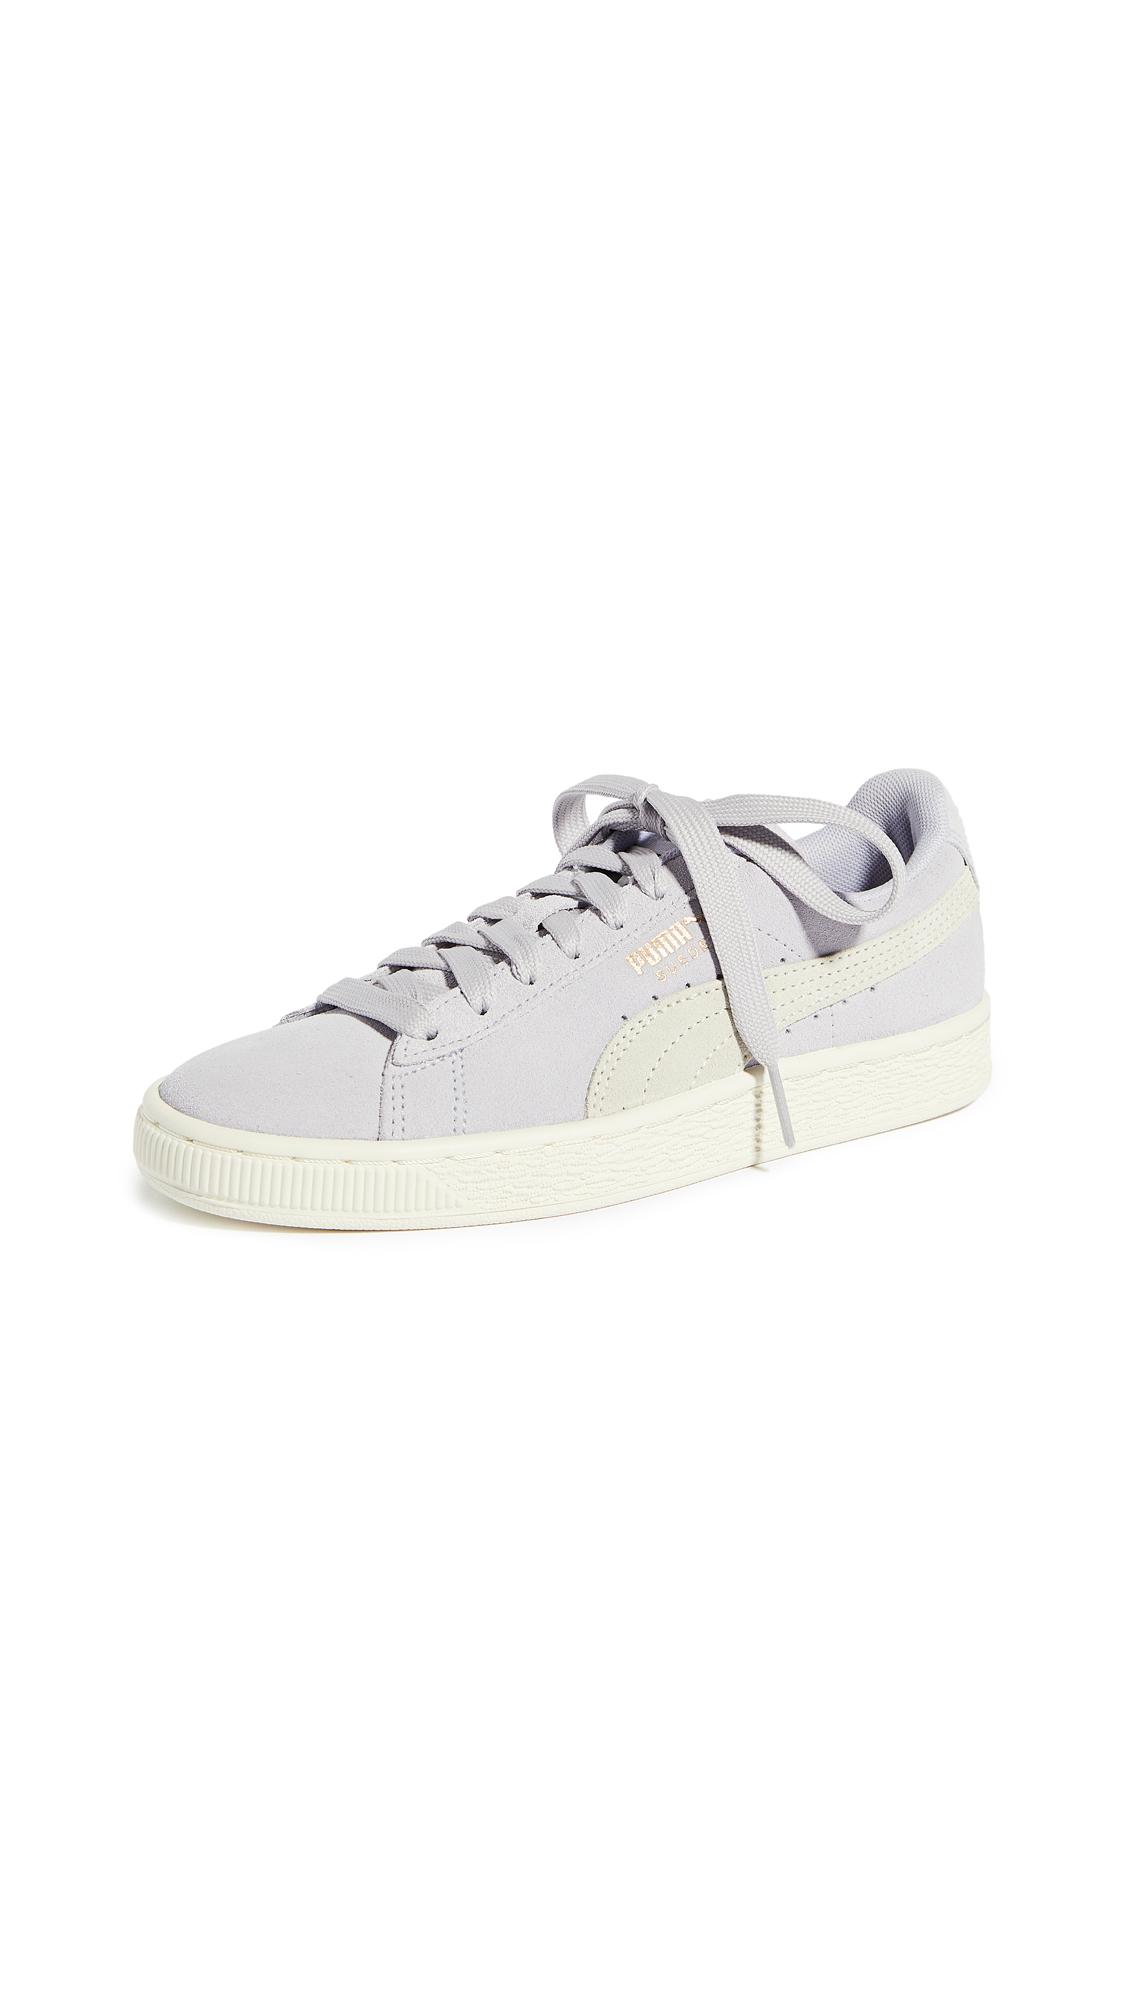 Buy PUMA Suede Classic Plus Sneakers online, shop PUMA